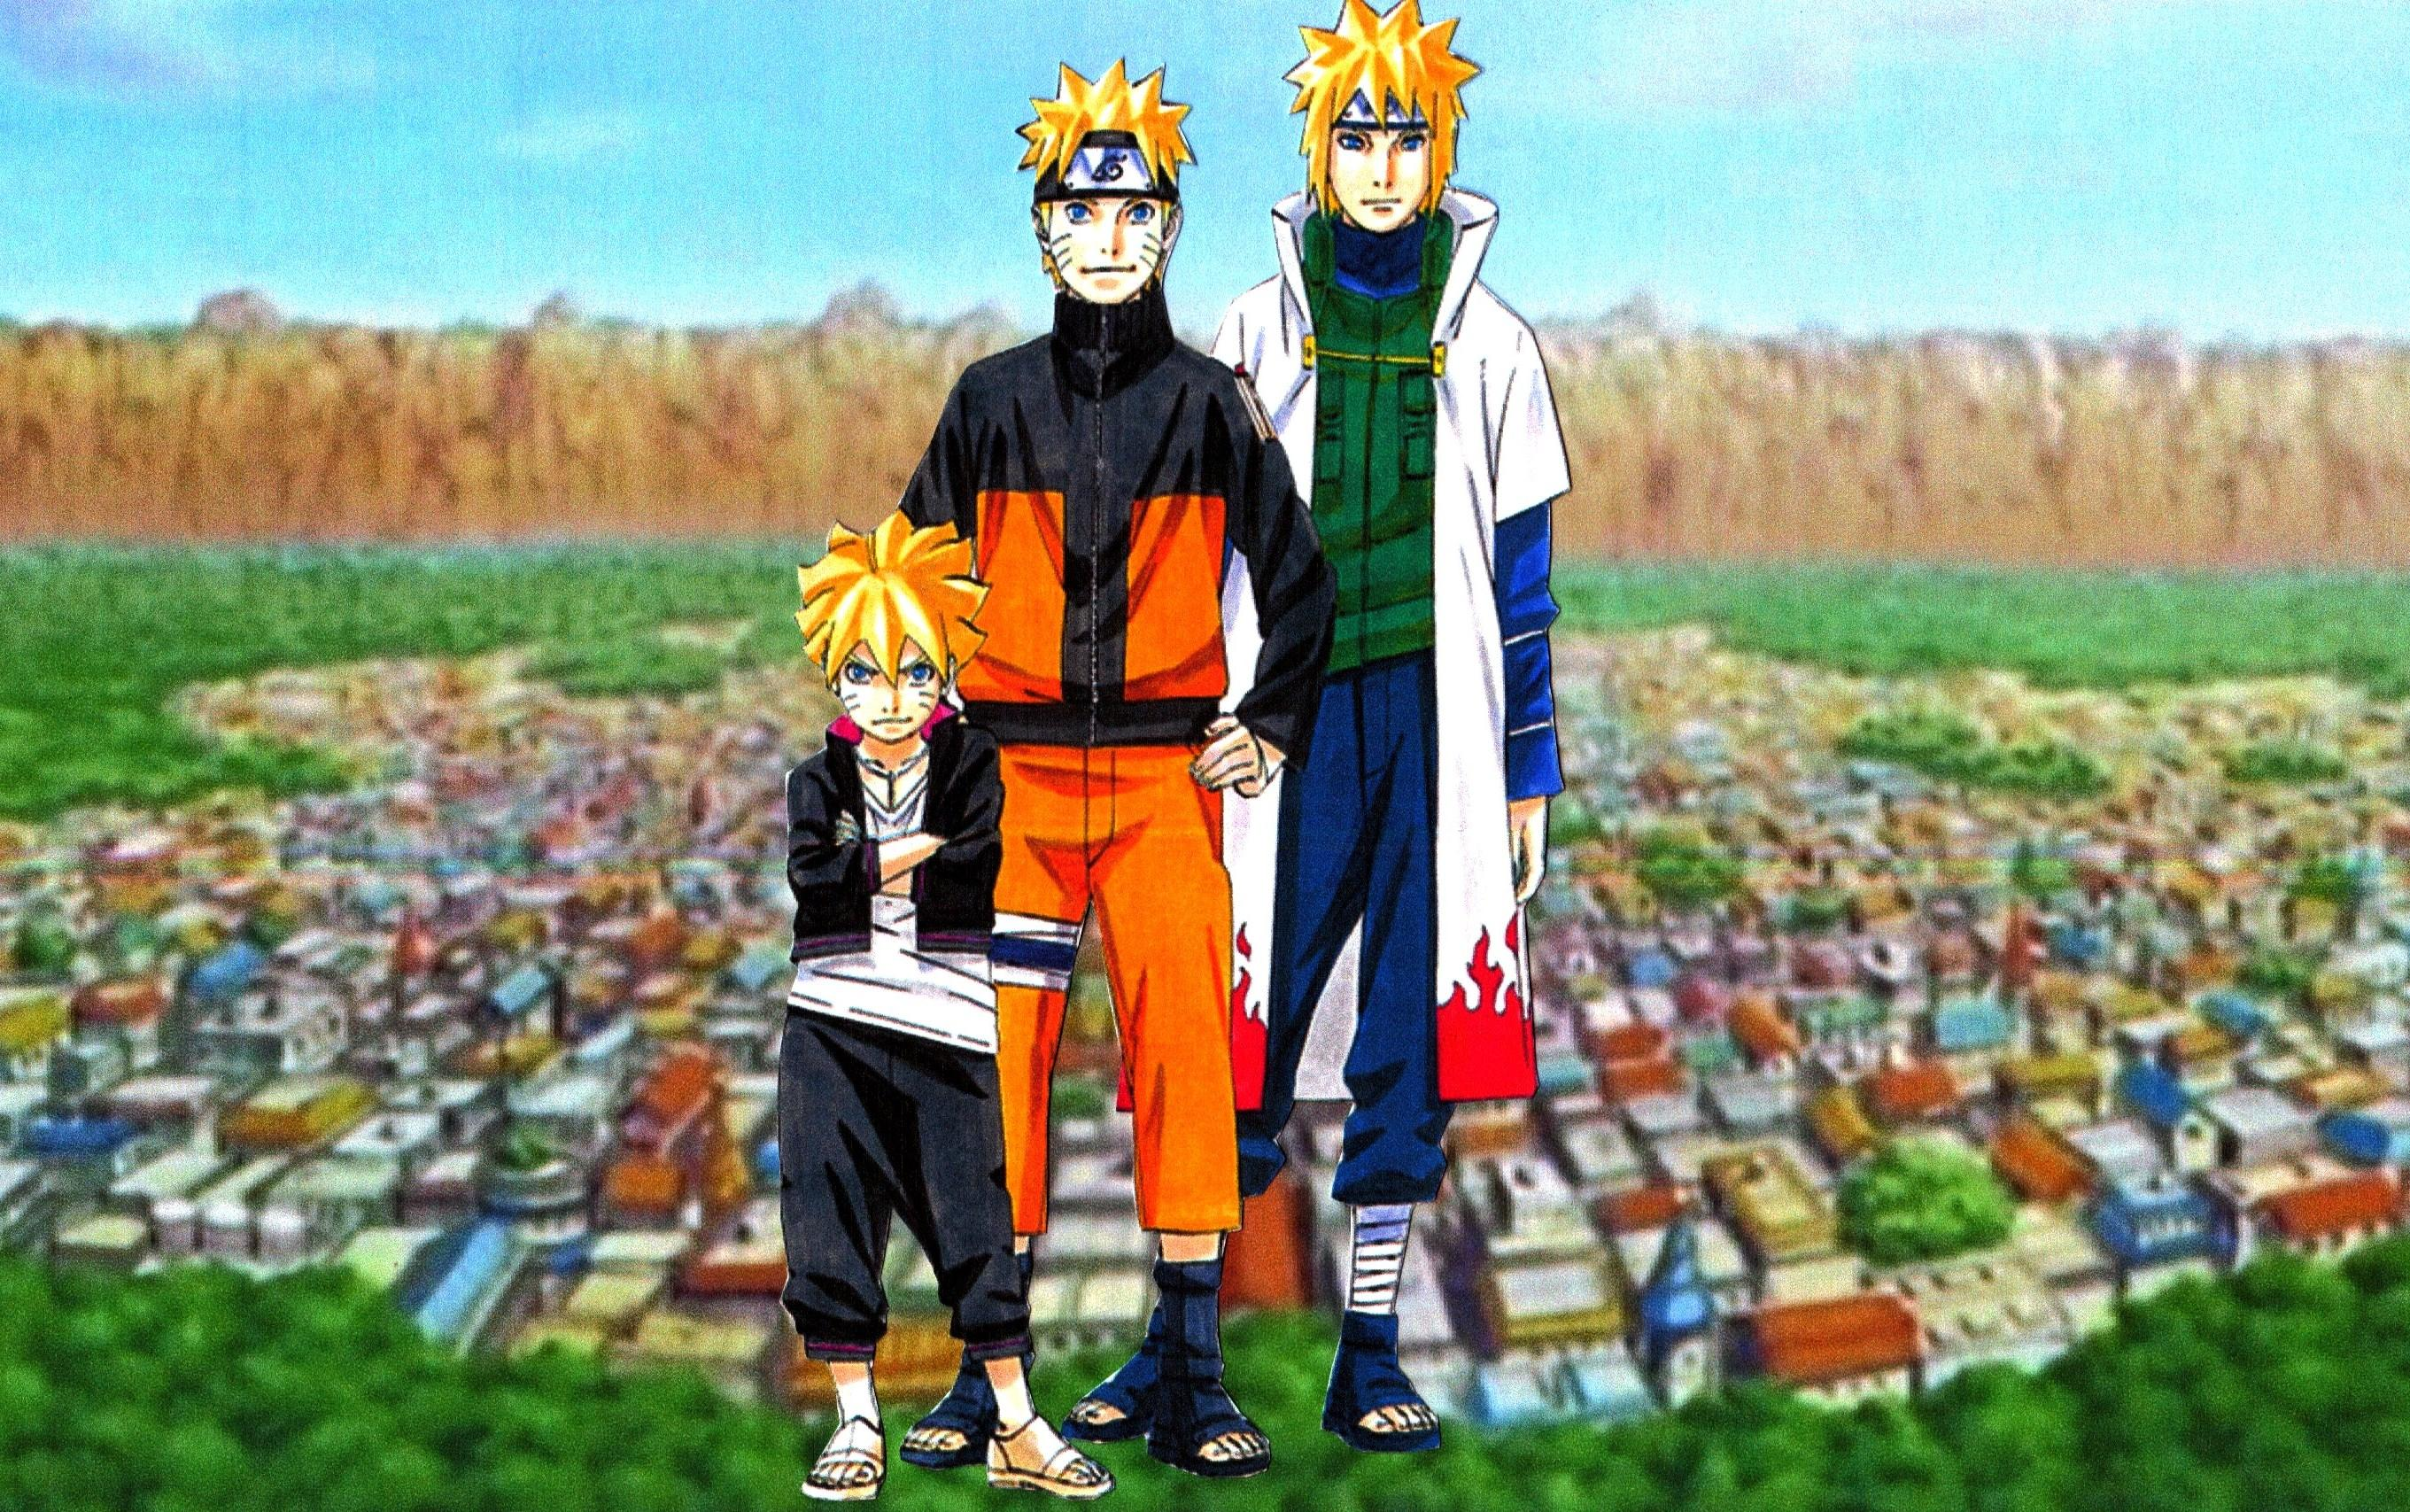 Minato Naruto Boruto Wallpaper 2 by weissdrum 2721x1707